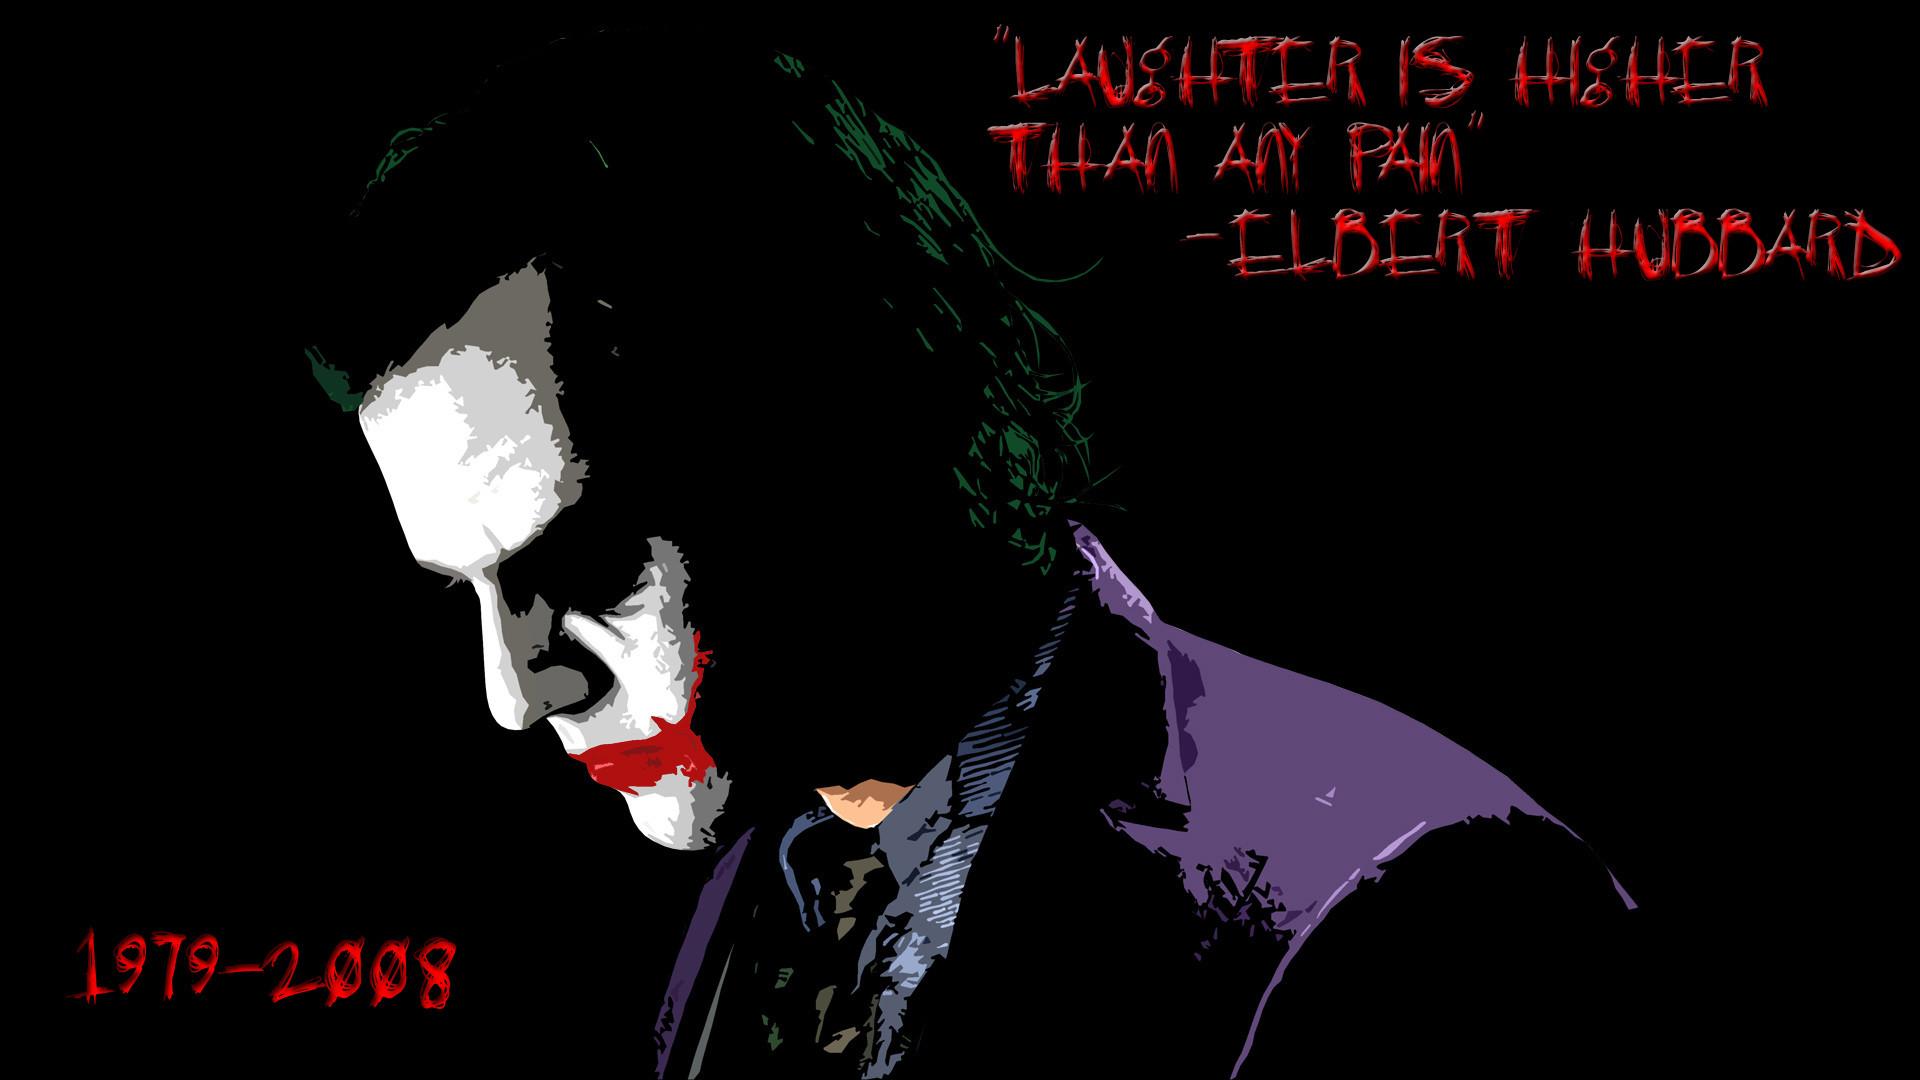 … Batman The Dark Knight Joker Quotes Joker Quotes Wallpapers –  Wallpapersafari …